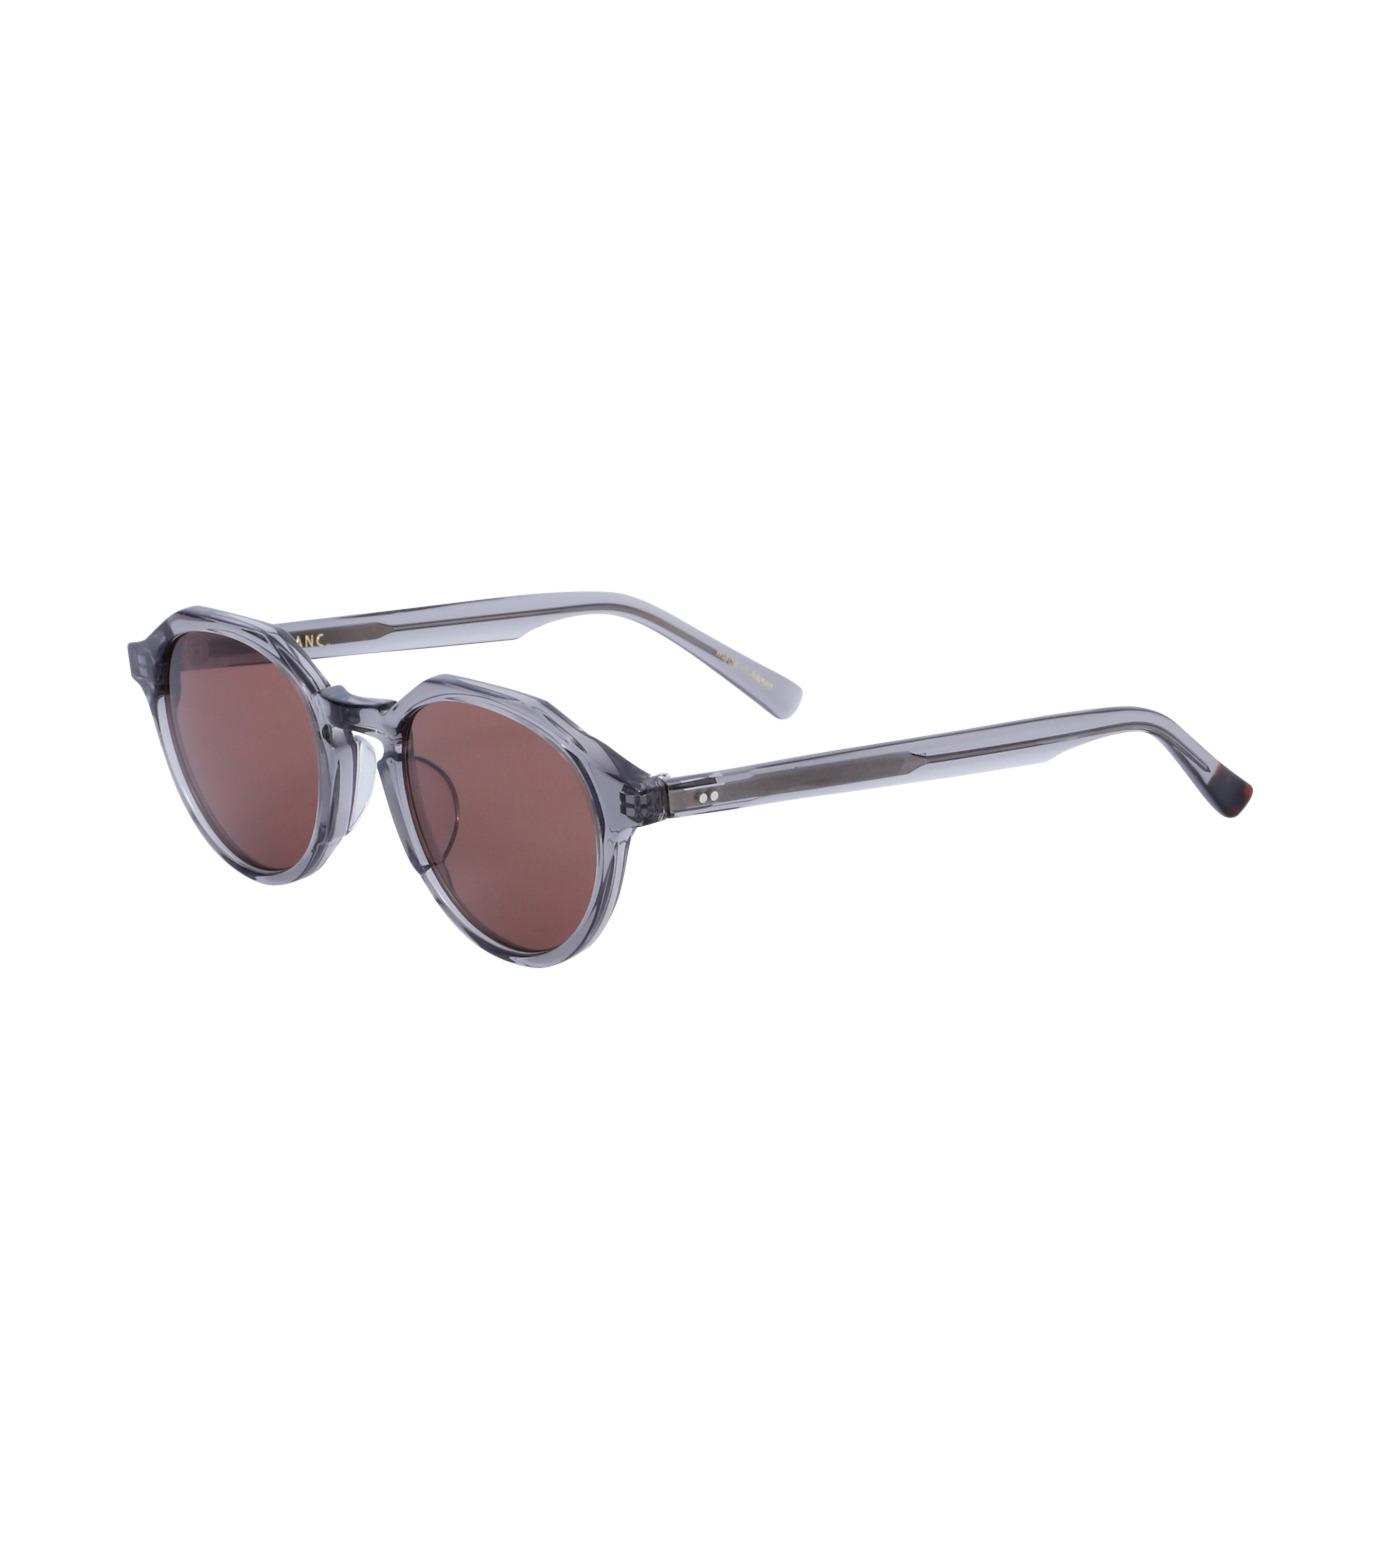 BLANC(ブラン)のOctagon Sunglass-GRAY(アイウェア/eyewear)-BM001-11 拡大詳細画像1